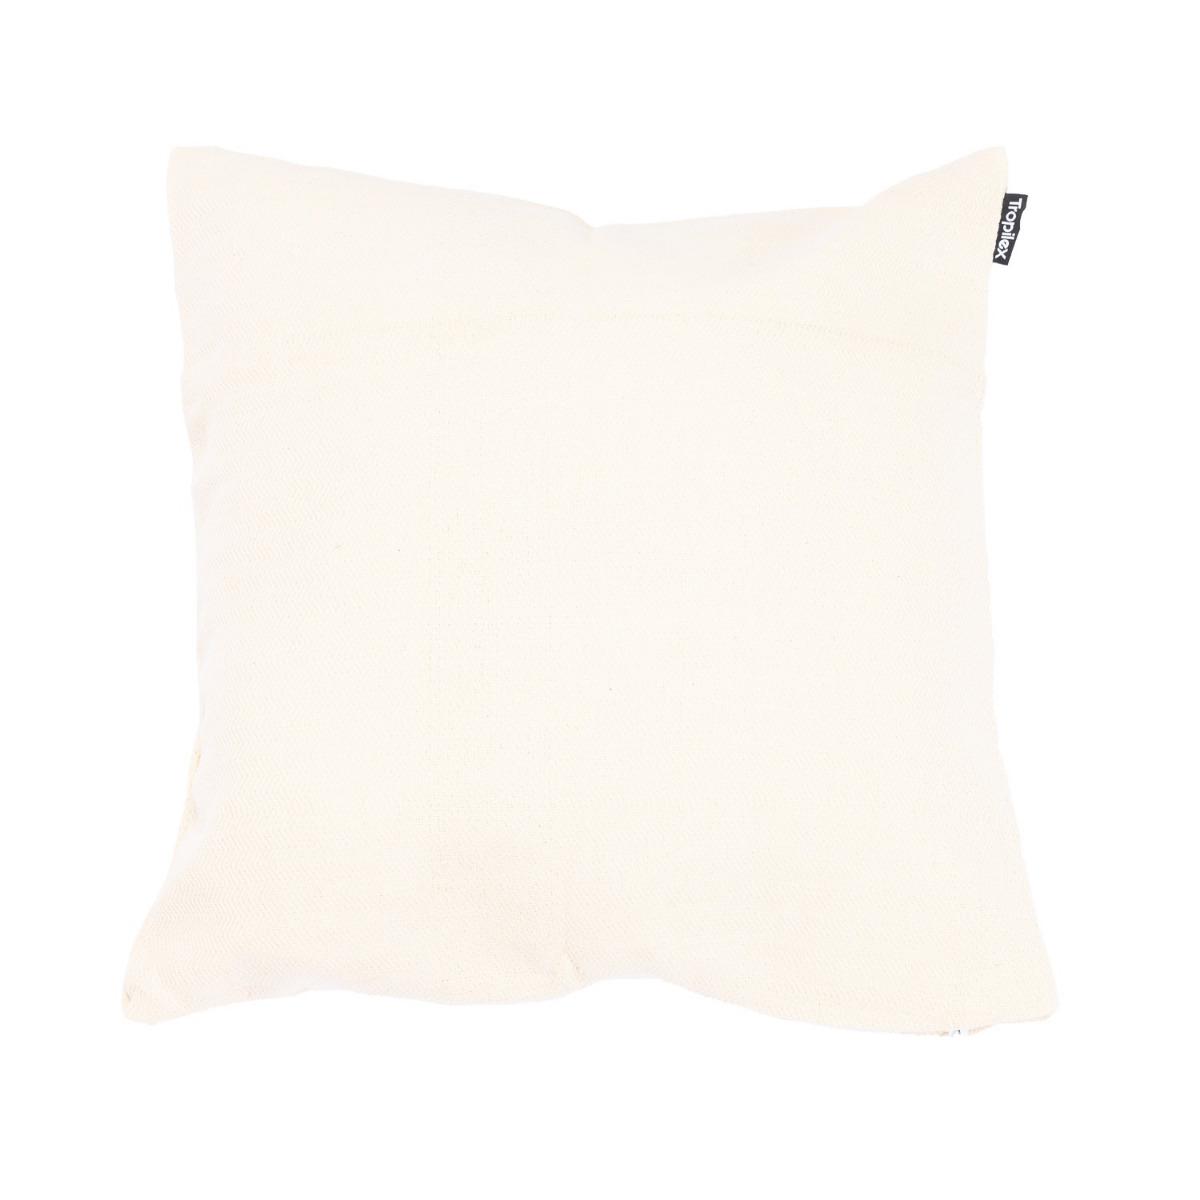 'Comfort' White Kussentje - Wit - Ecru - Tropilex �